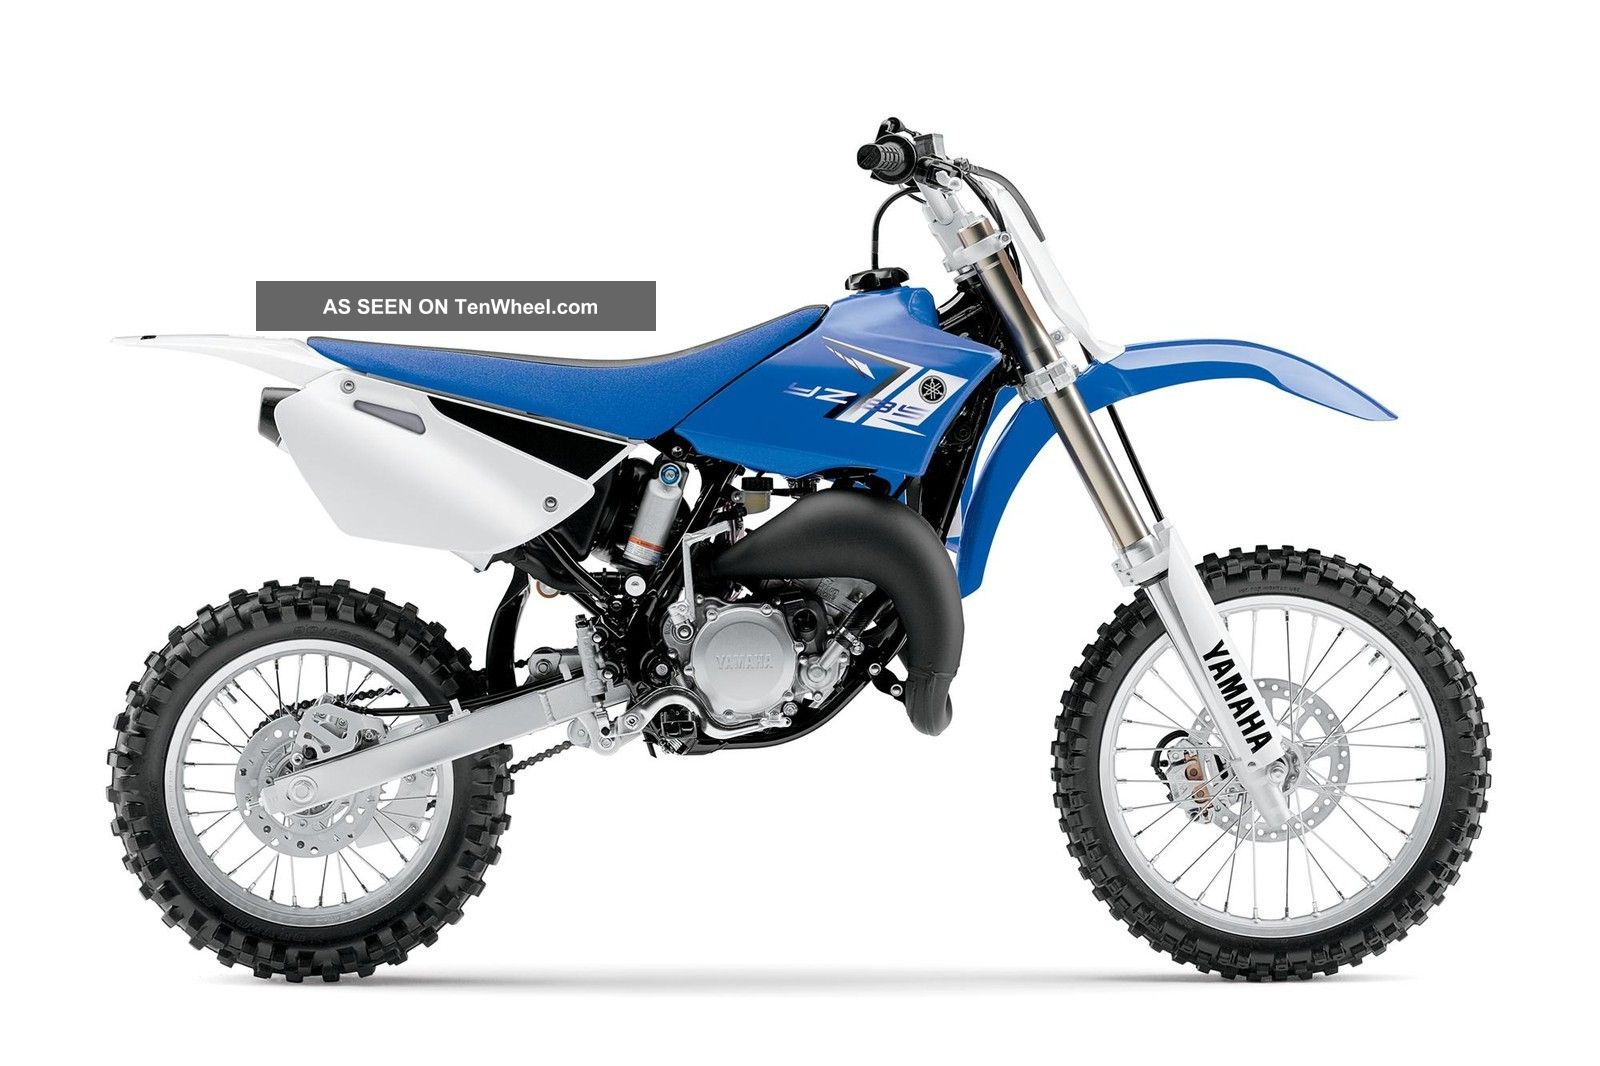 2013 Yz85 2 - Stroke Race Bike When You ' Ve Outgrown The Toys $no Prep Fees YZ photo